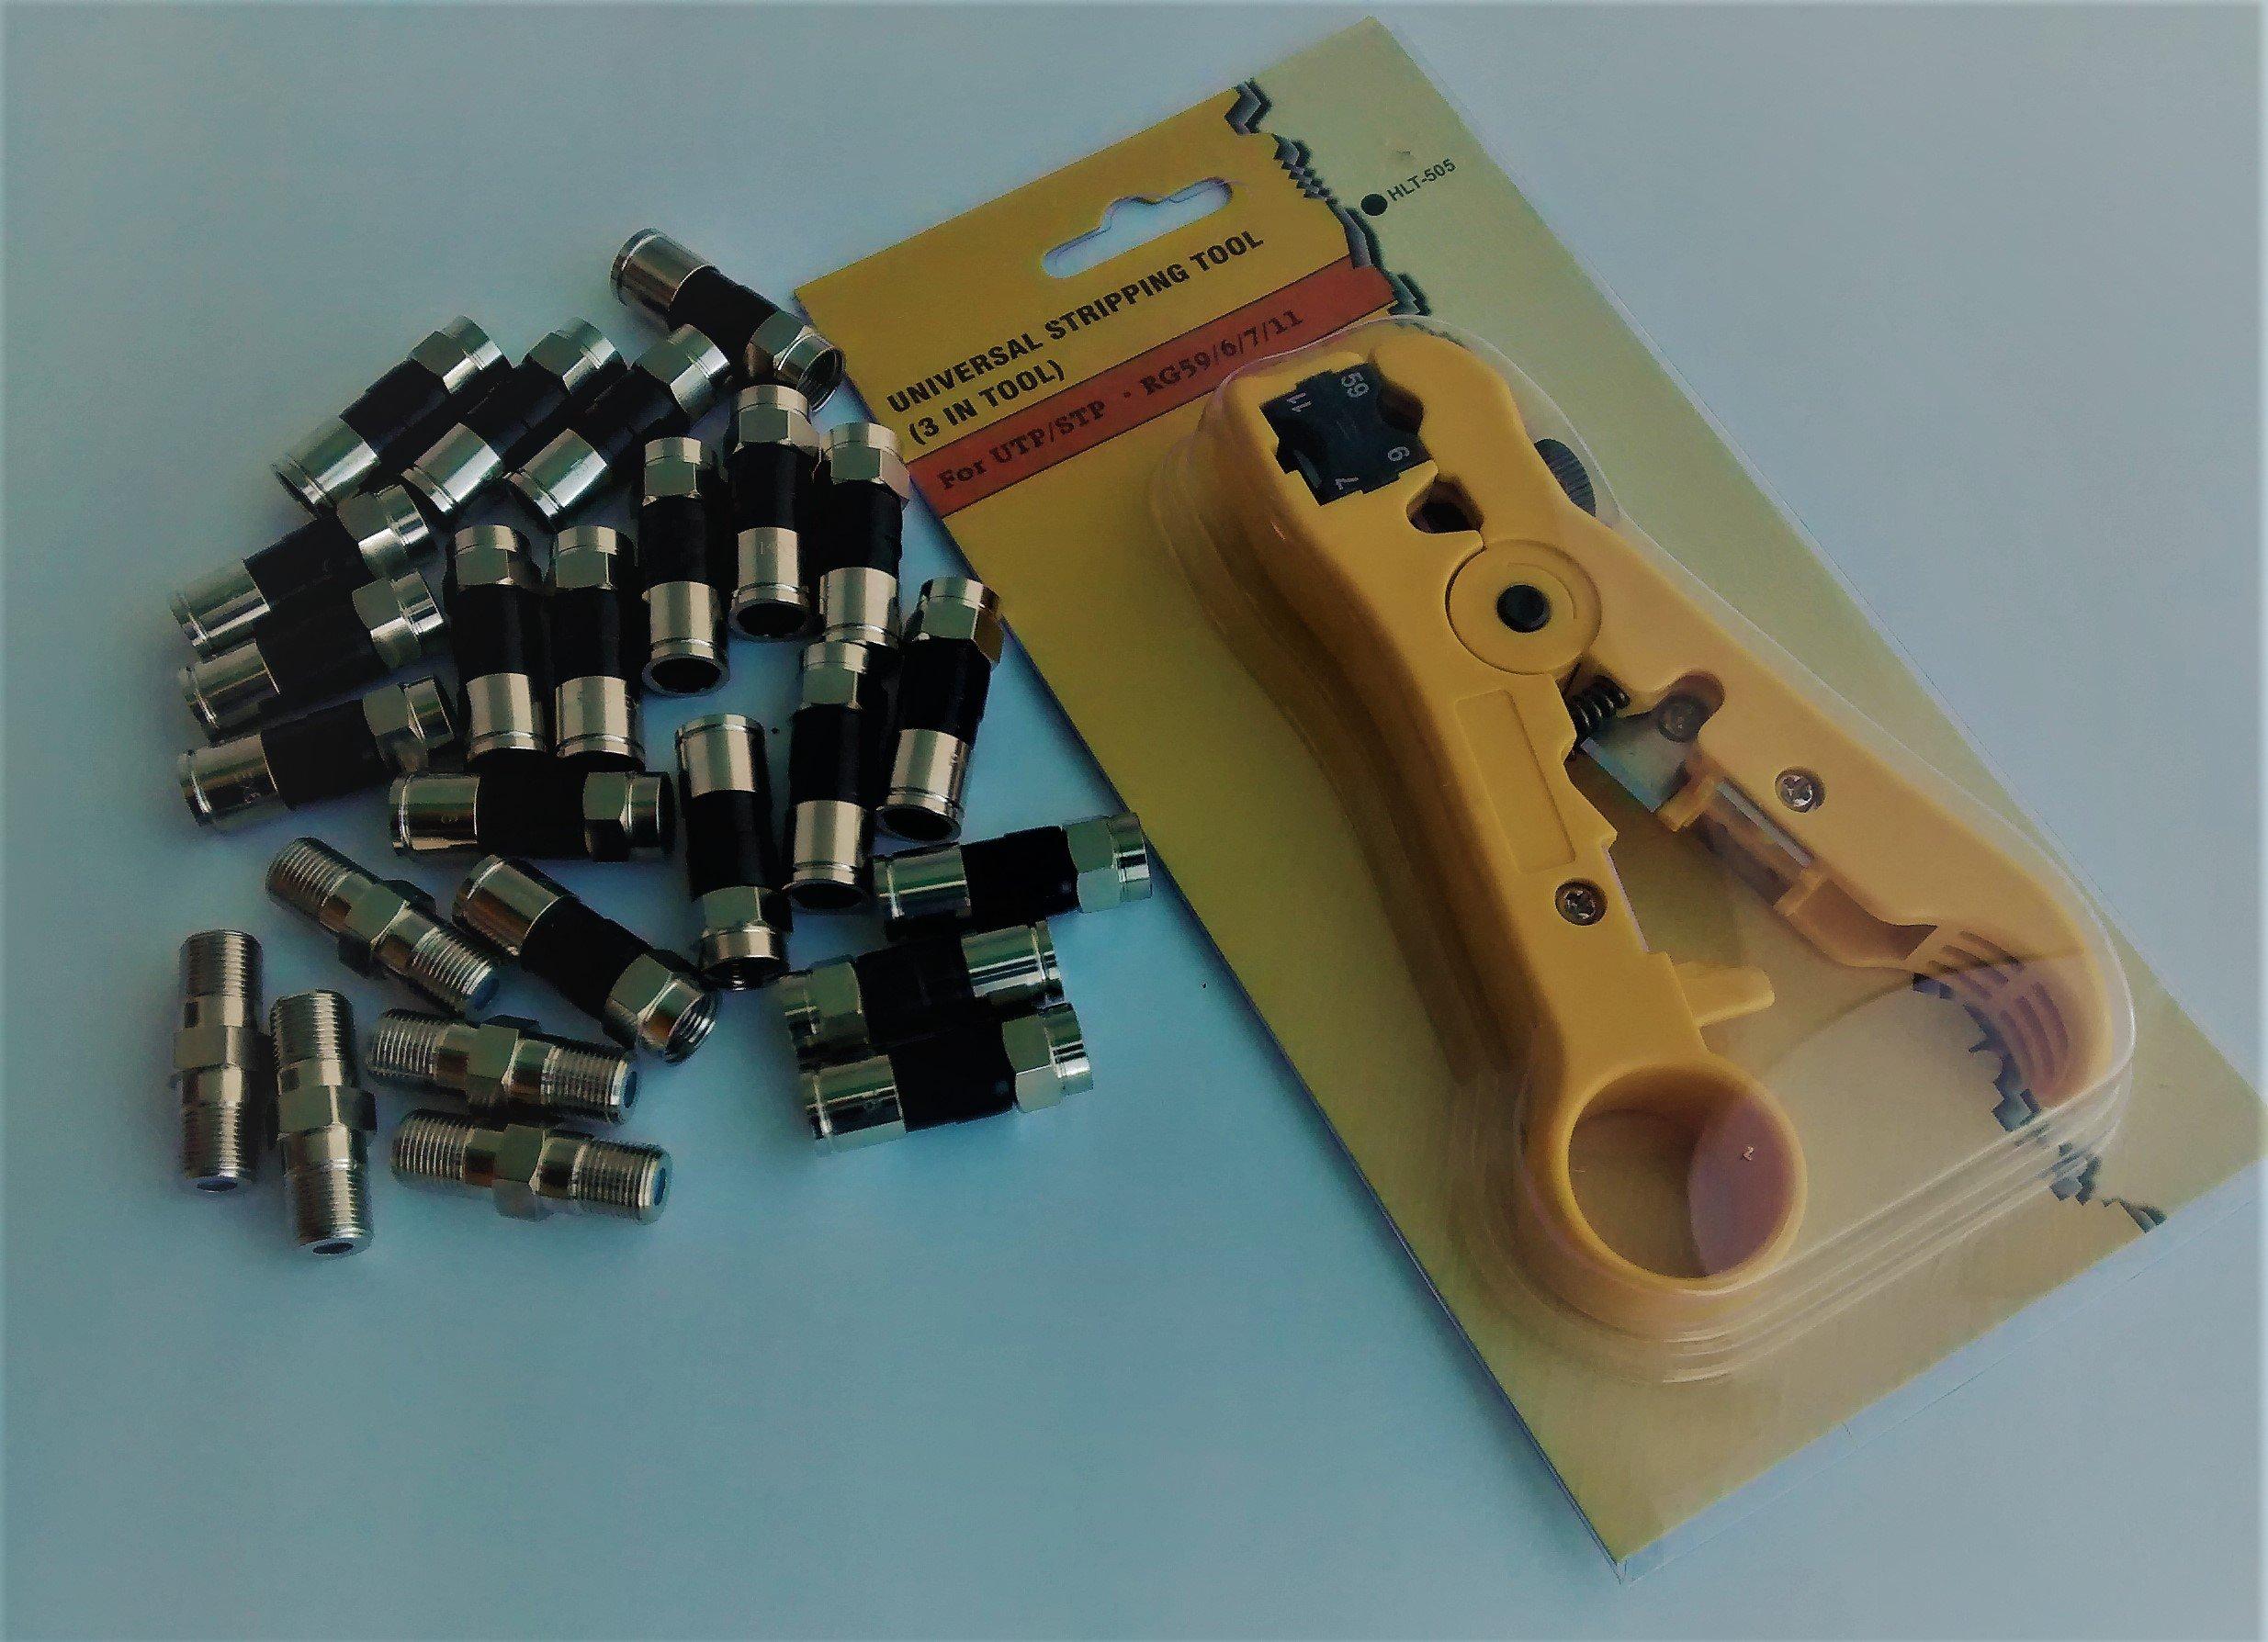 Coax Compression Connector Starter Kit - RG6 PPC EX6 XL (Belden/PPC) Quad Connectors, Universal Stripper/cutter Tool and PPC High Freq Barrel Connectors - Rg6/RG59 Series